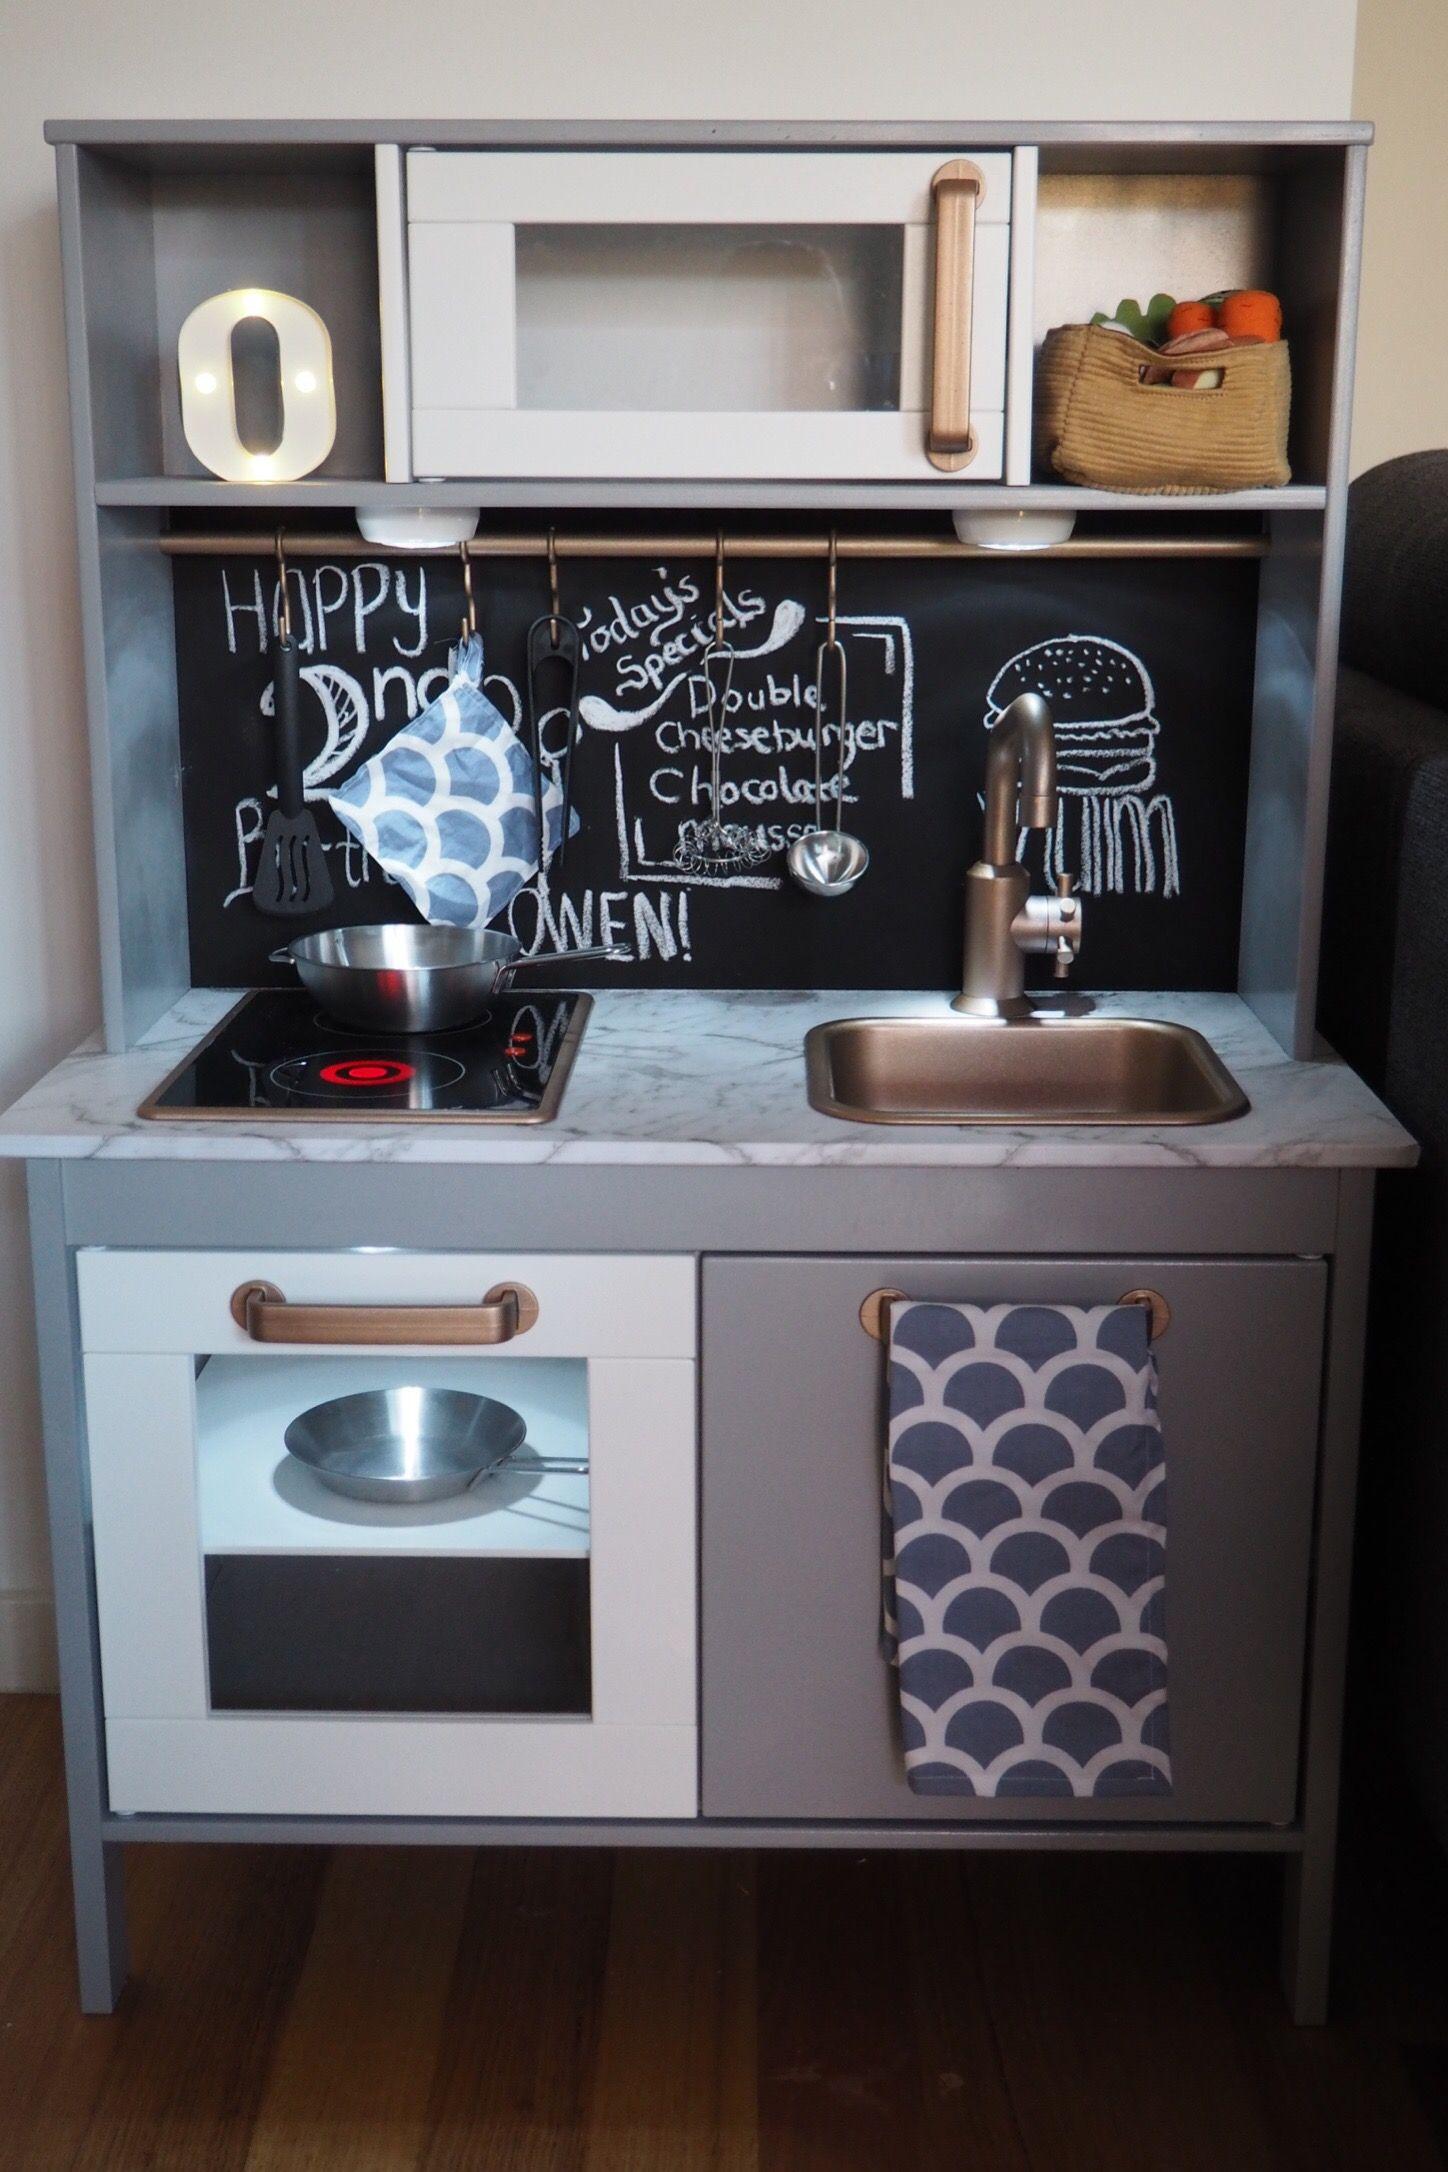 Ikea Duktig Kitchen Hack With Blackboard Splashback Copper Fixings And Handmade Tea Towel Duktig Kuche